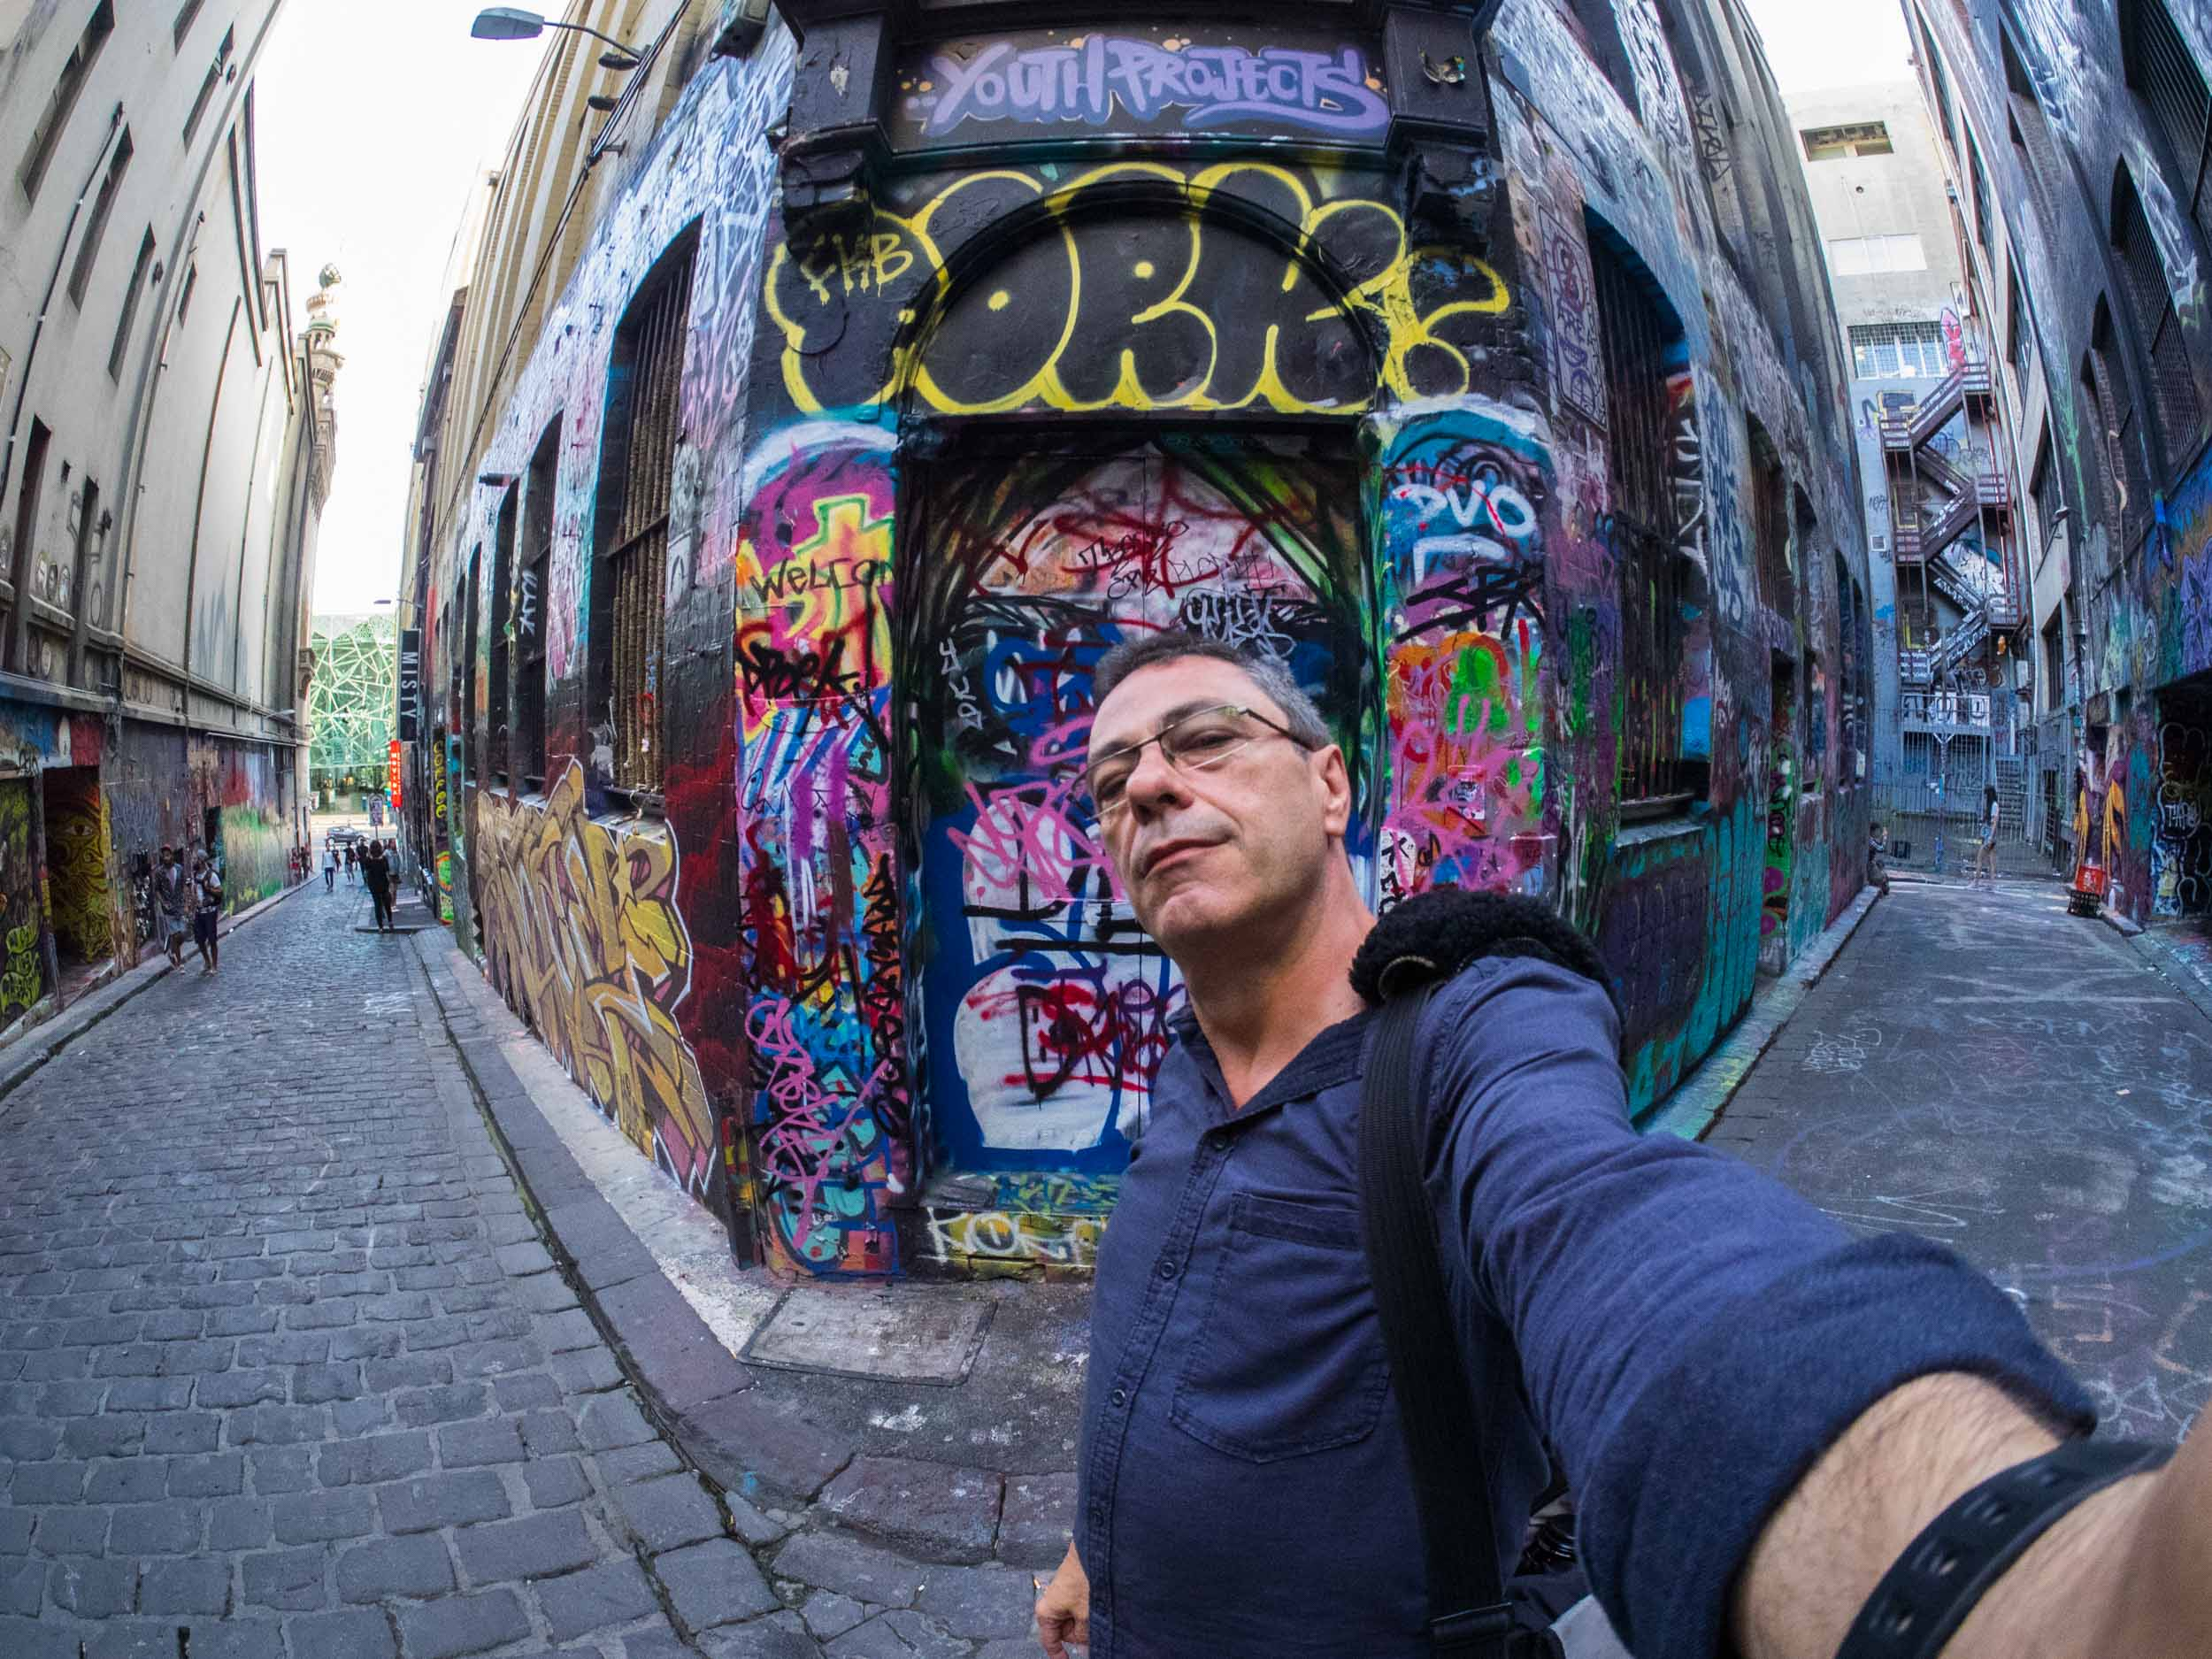 street photography courses sydney-1.jpg